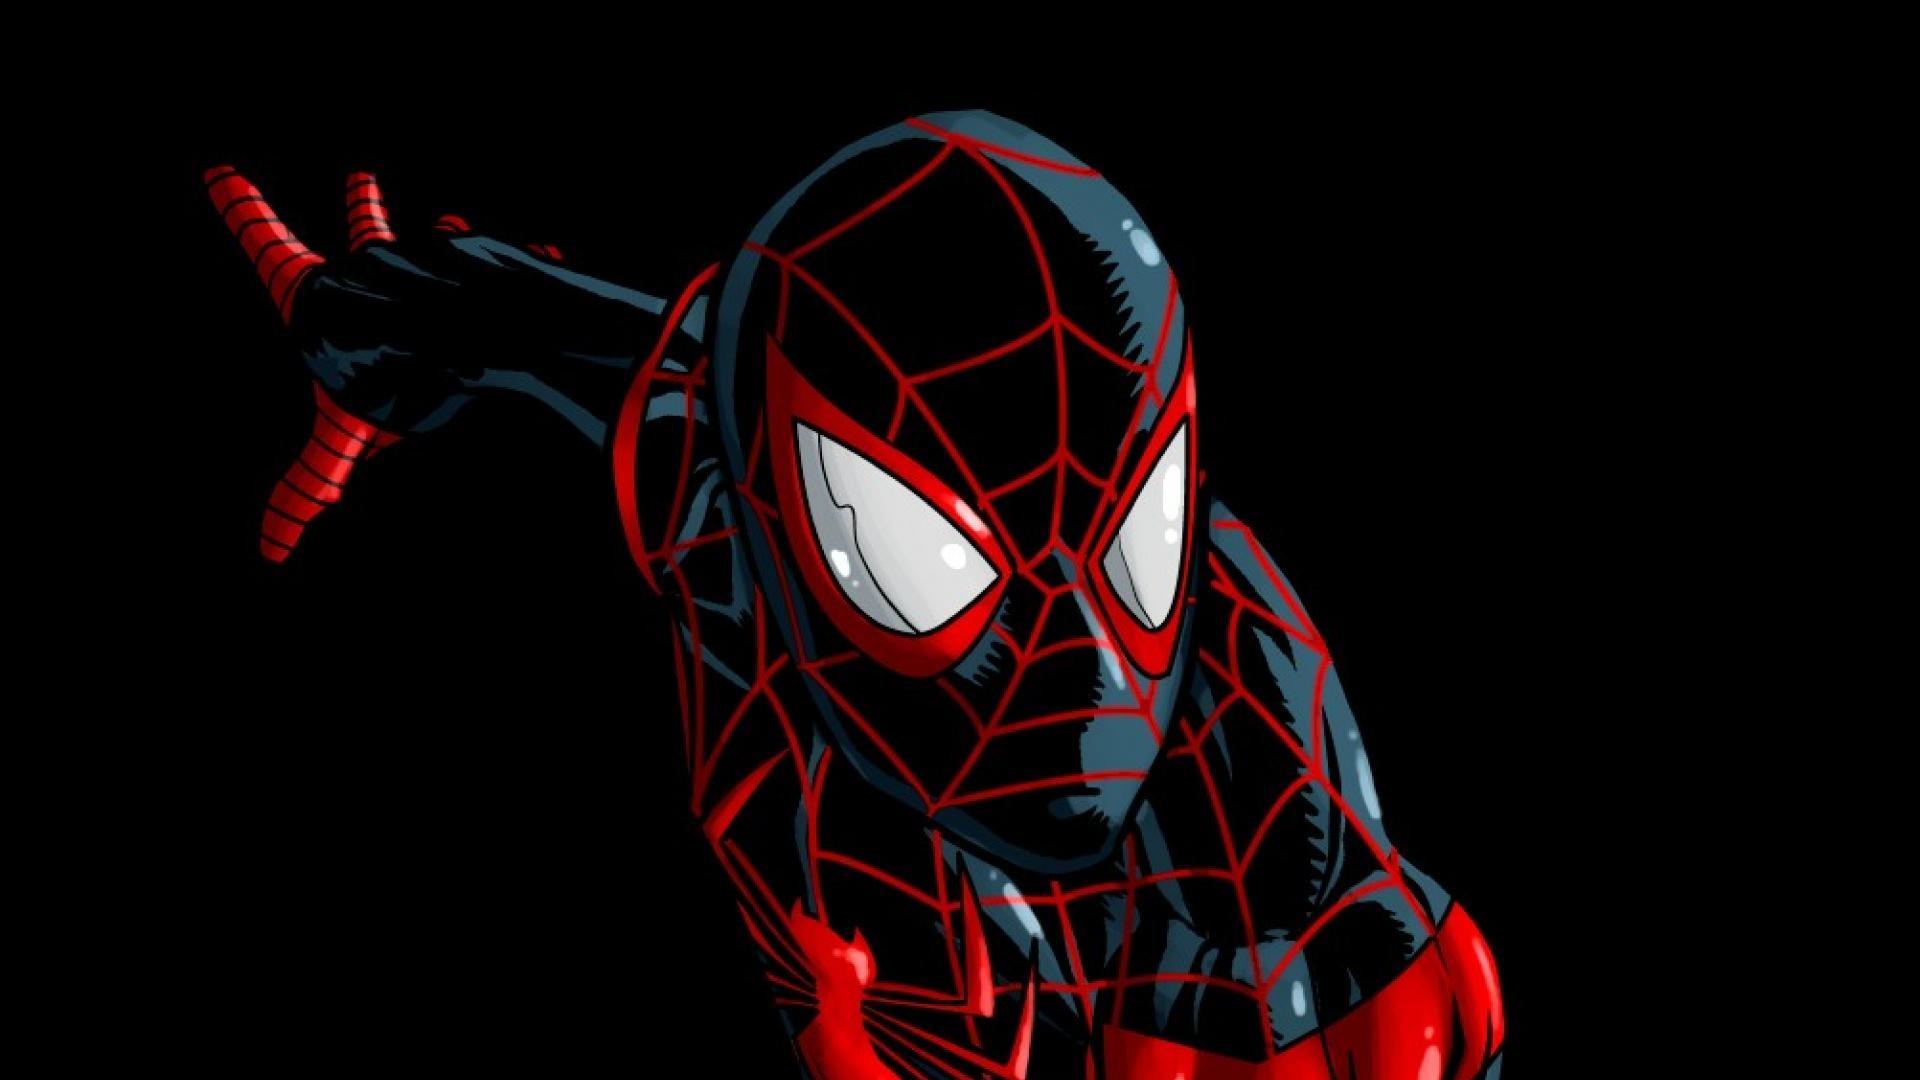 Comics spider-man superheroes marvel ultimate miles morales wallpaper .